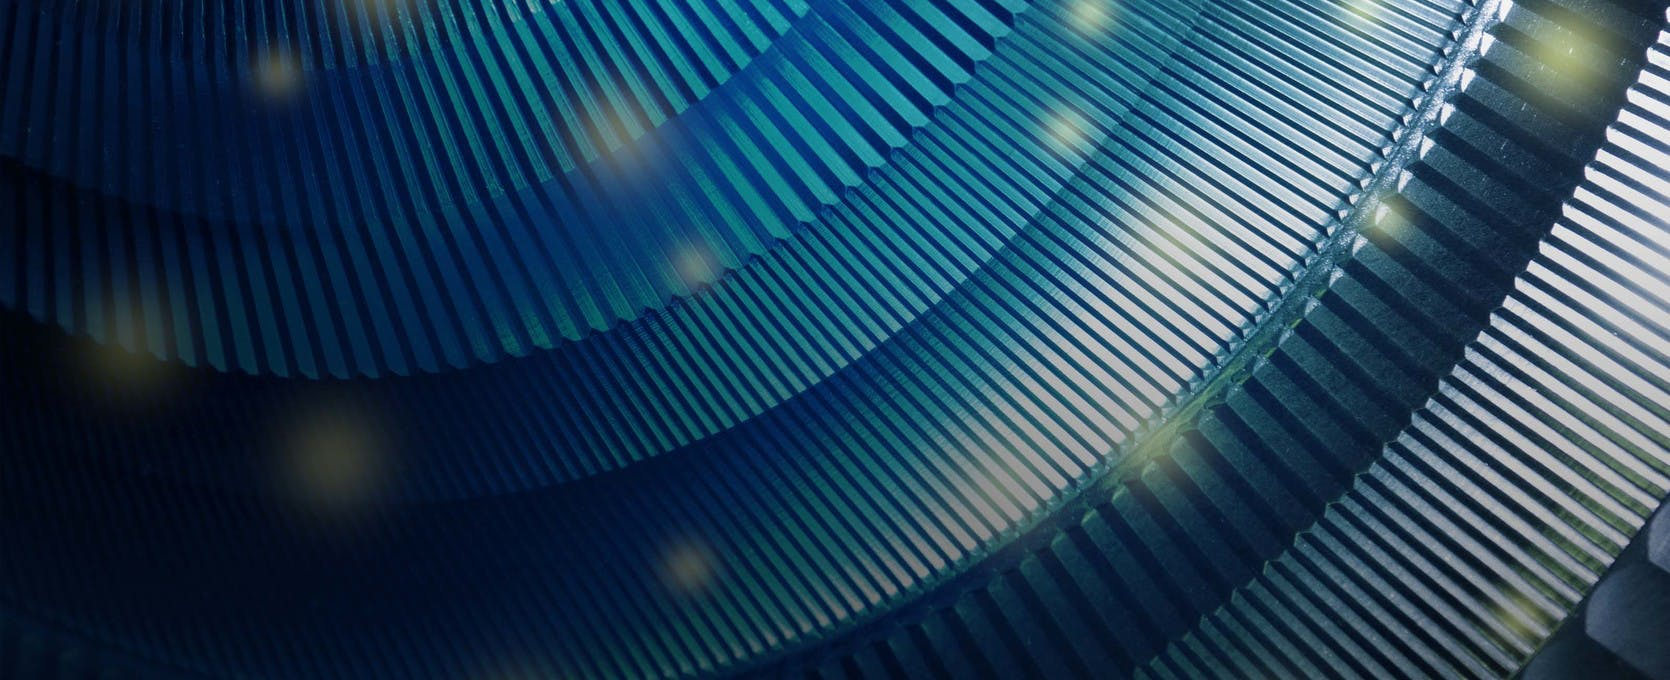 Circular metal pattern closeup